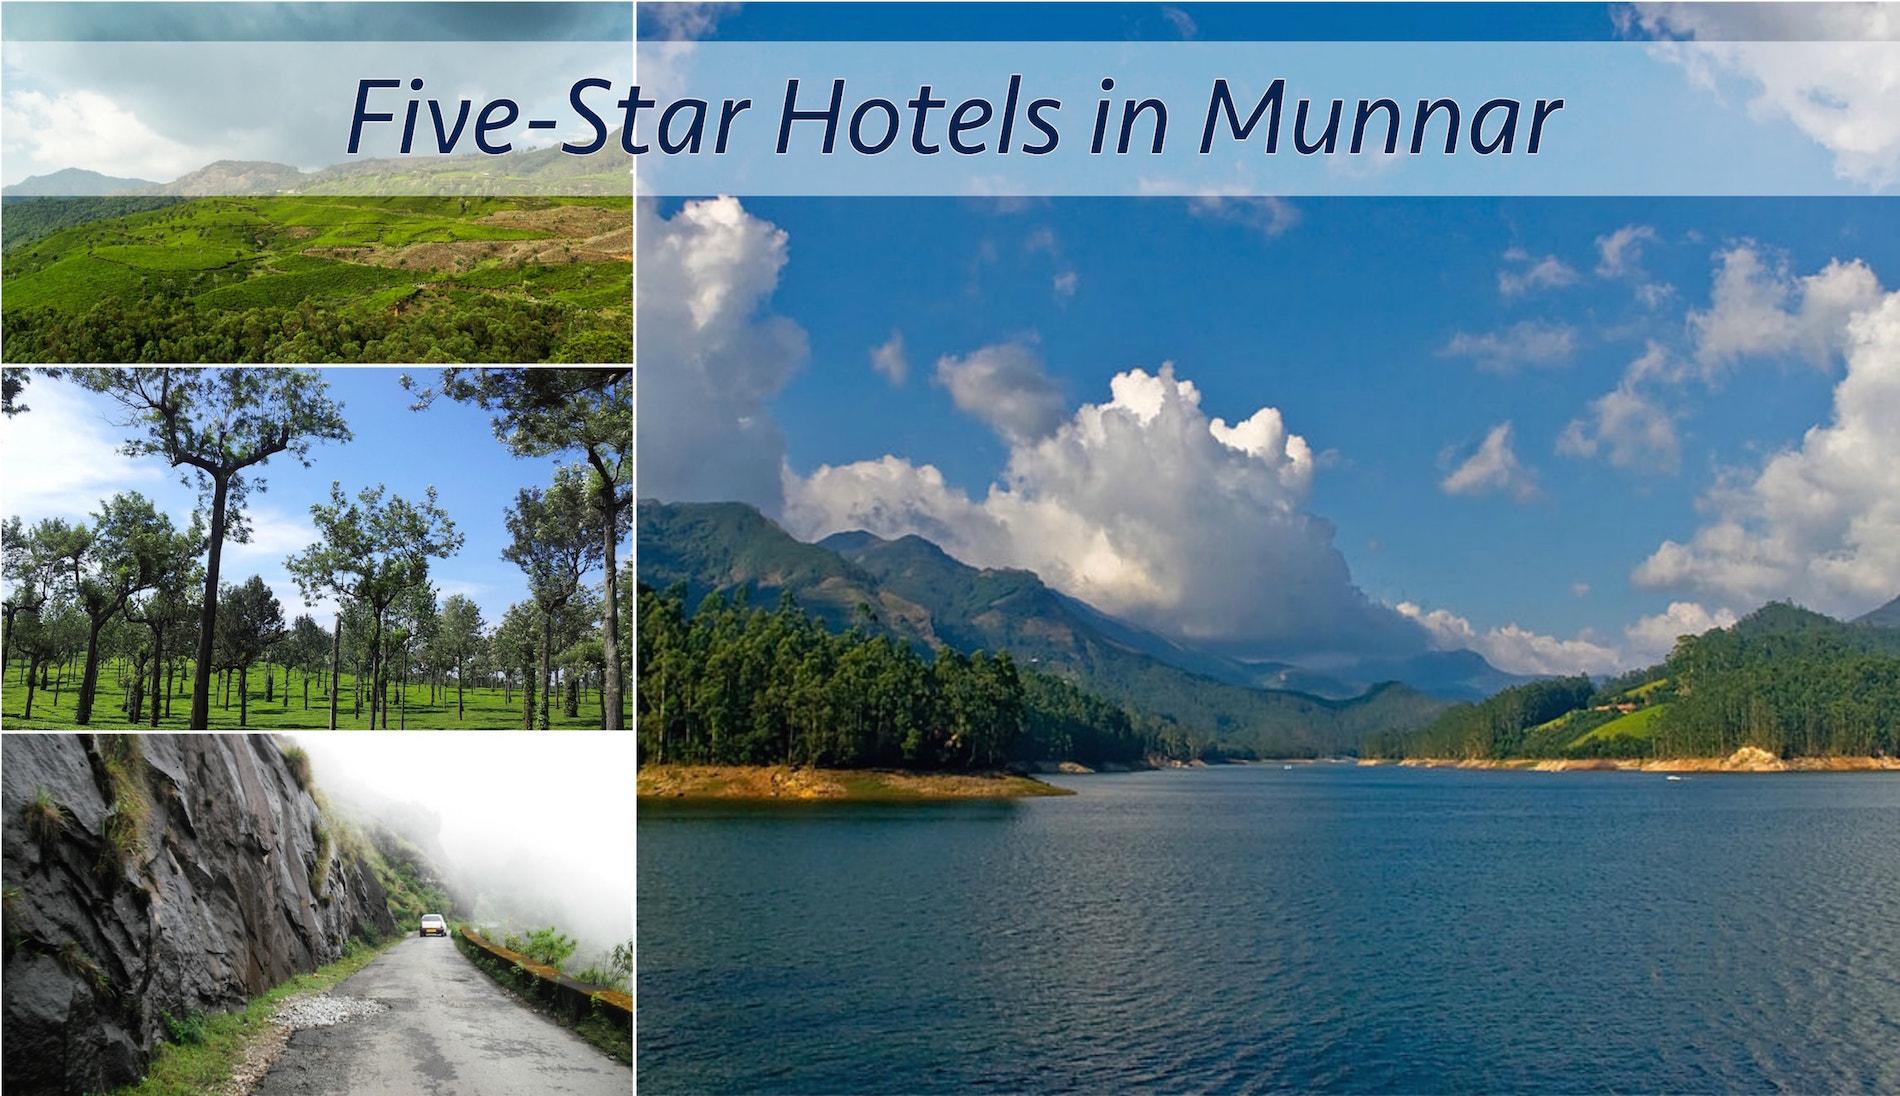 Munnar Hotels.jpg